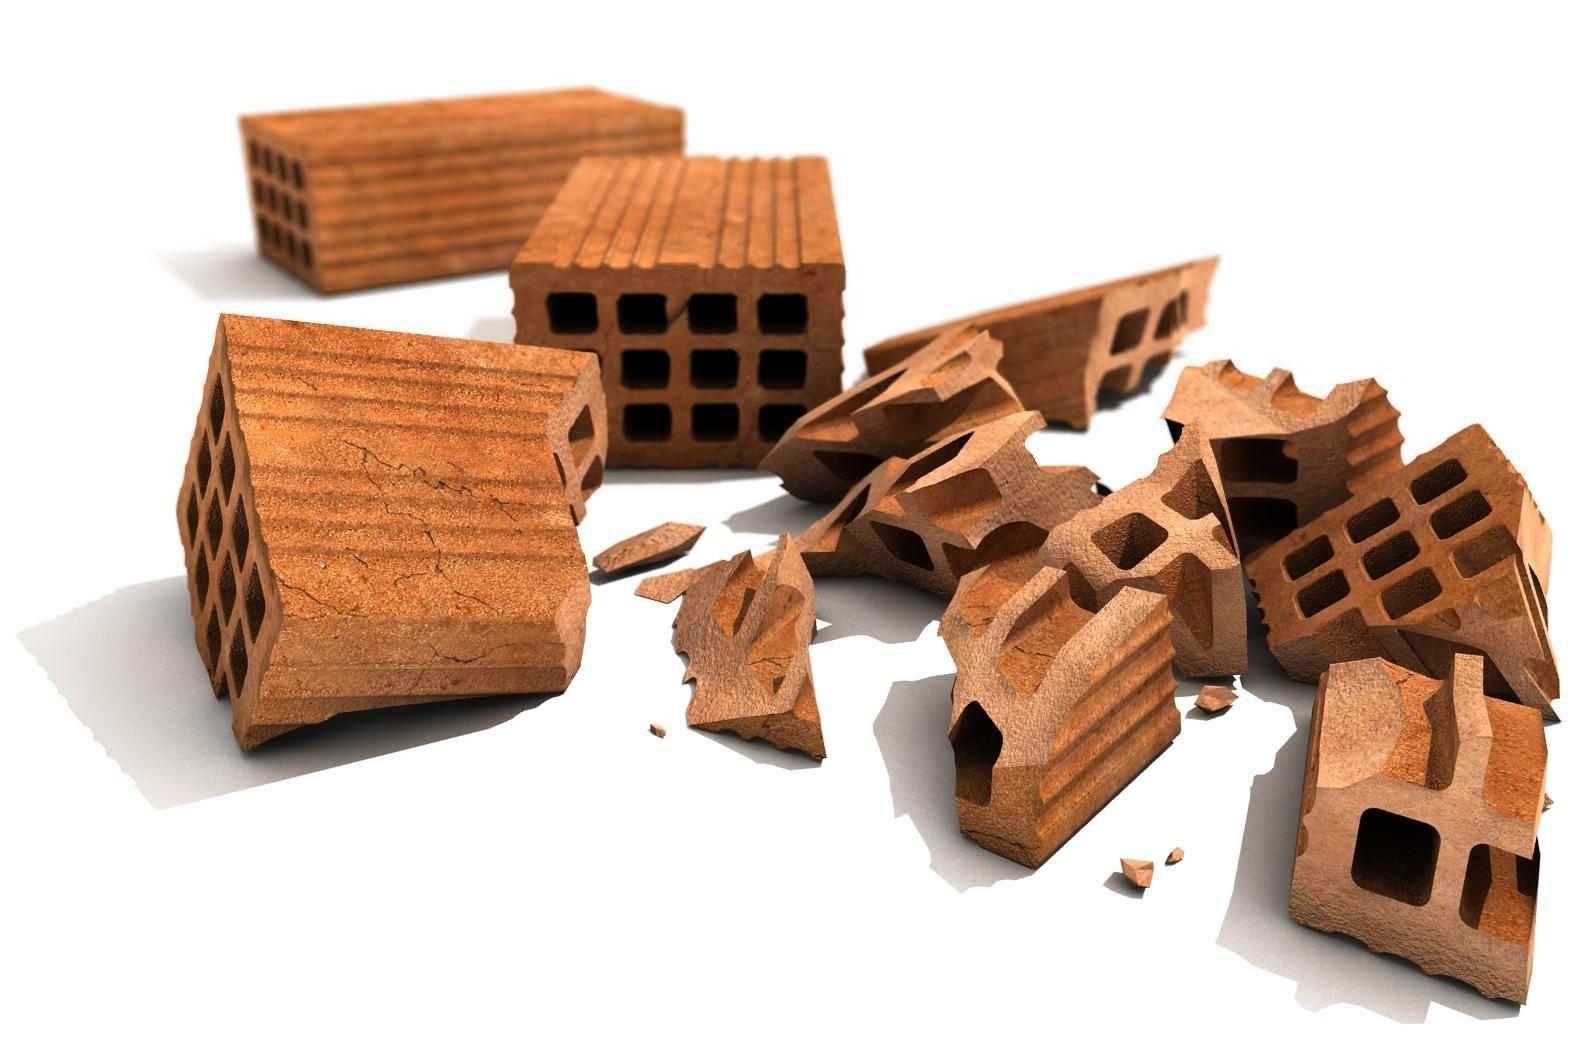 Materiales de construcci n en soria materiales de - Materiales de construccion tarragona ...